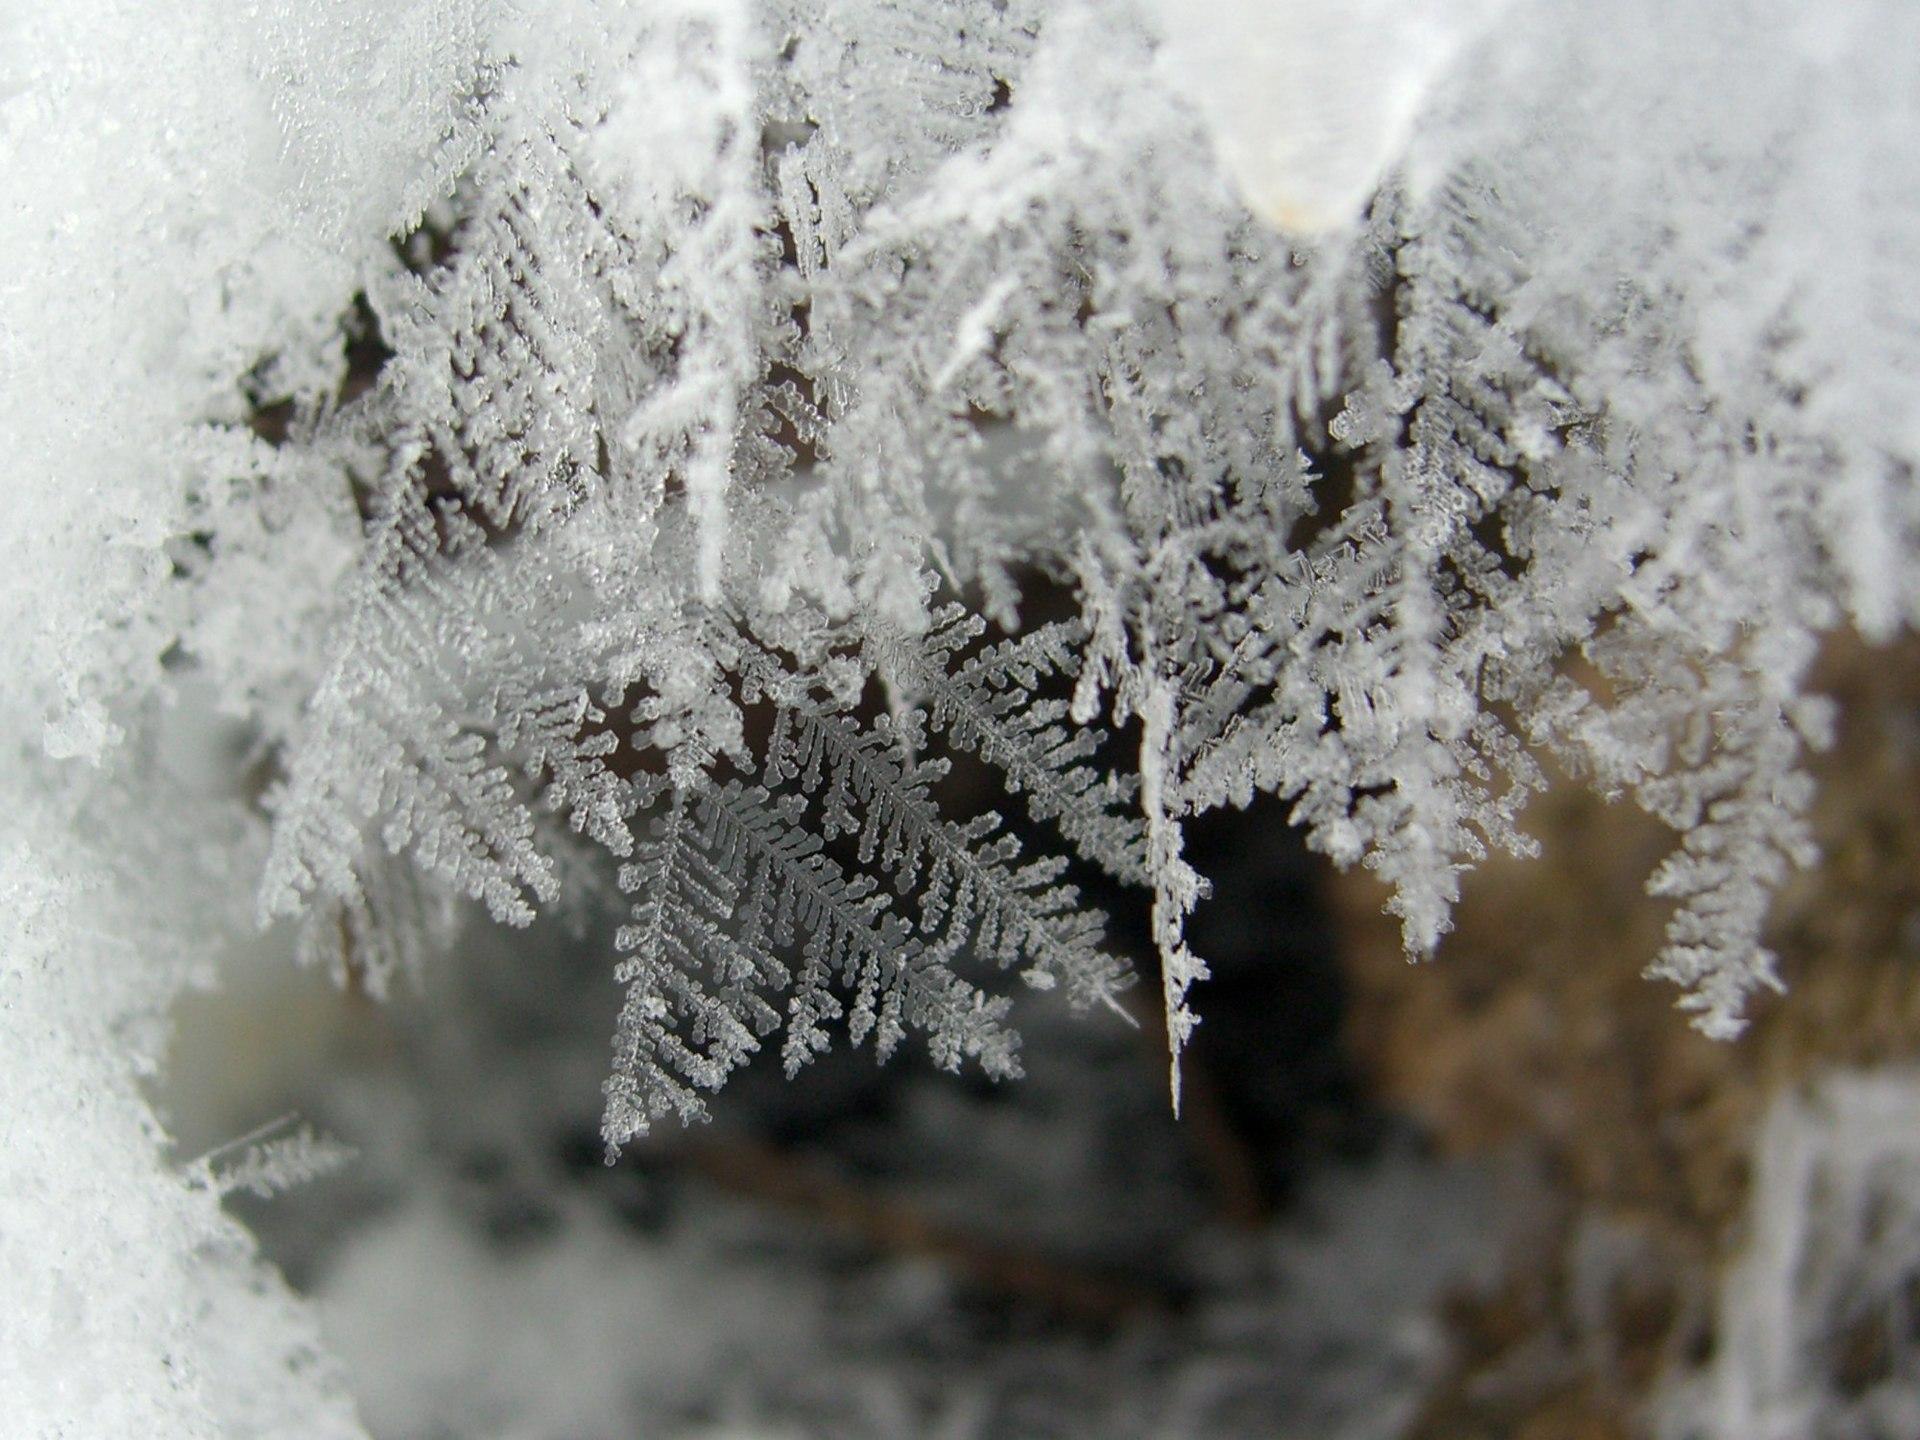 Snowflake - Wikipedia